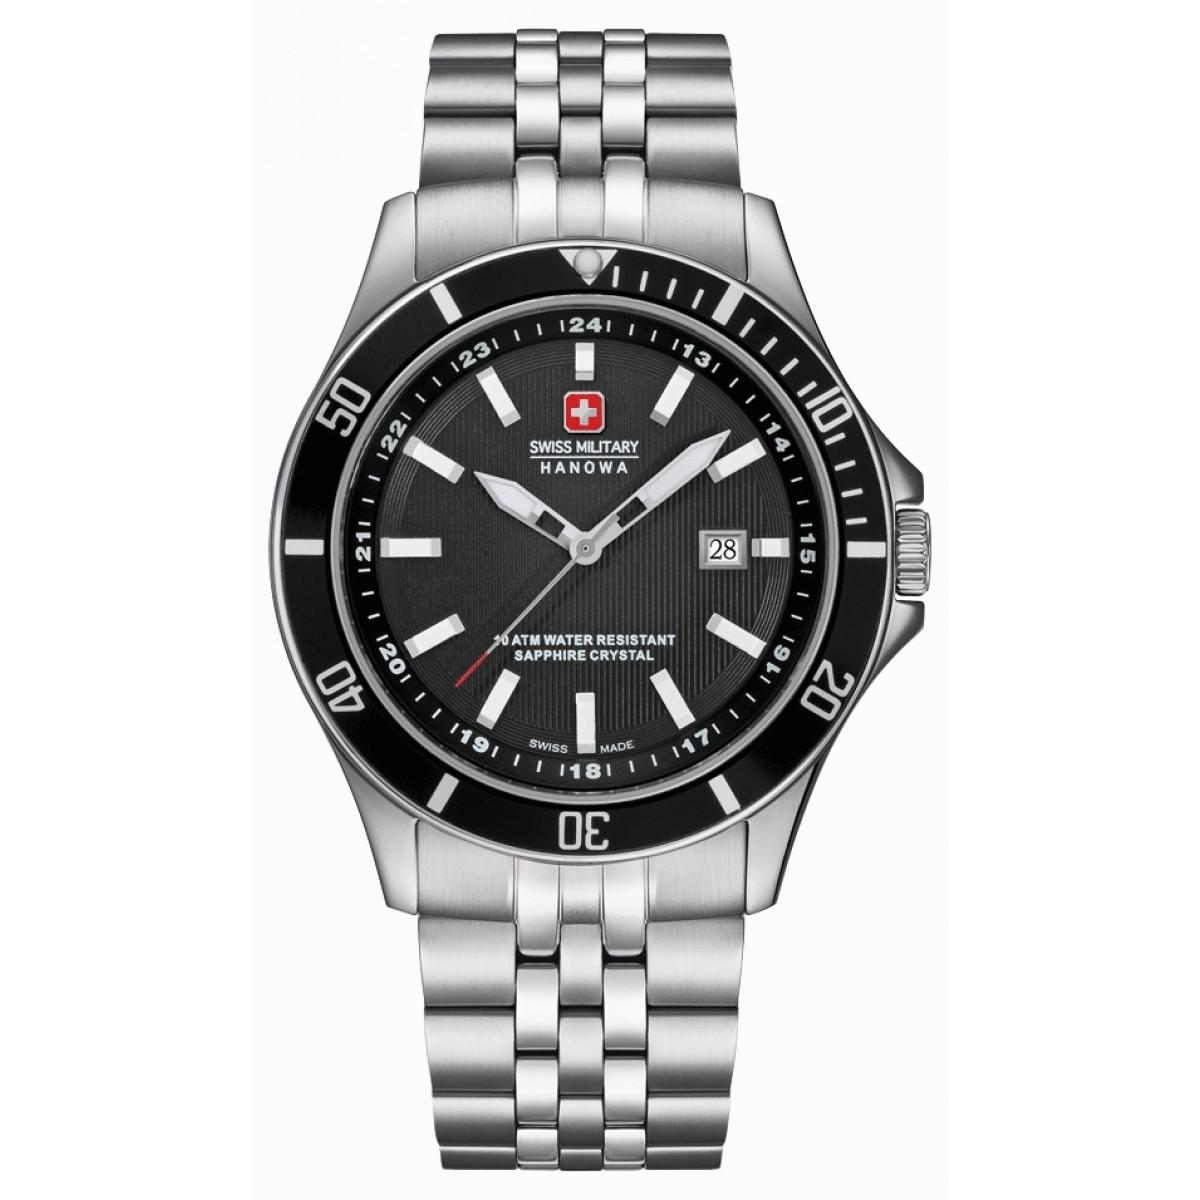 Swiss Military Hanowa Men's Quartz Watch 06-5161.7.04.007 06-5161.7.04.007 with Metal Strap